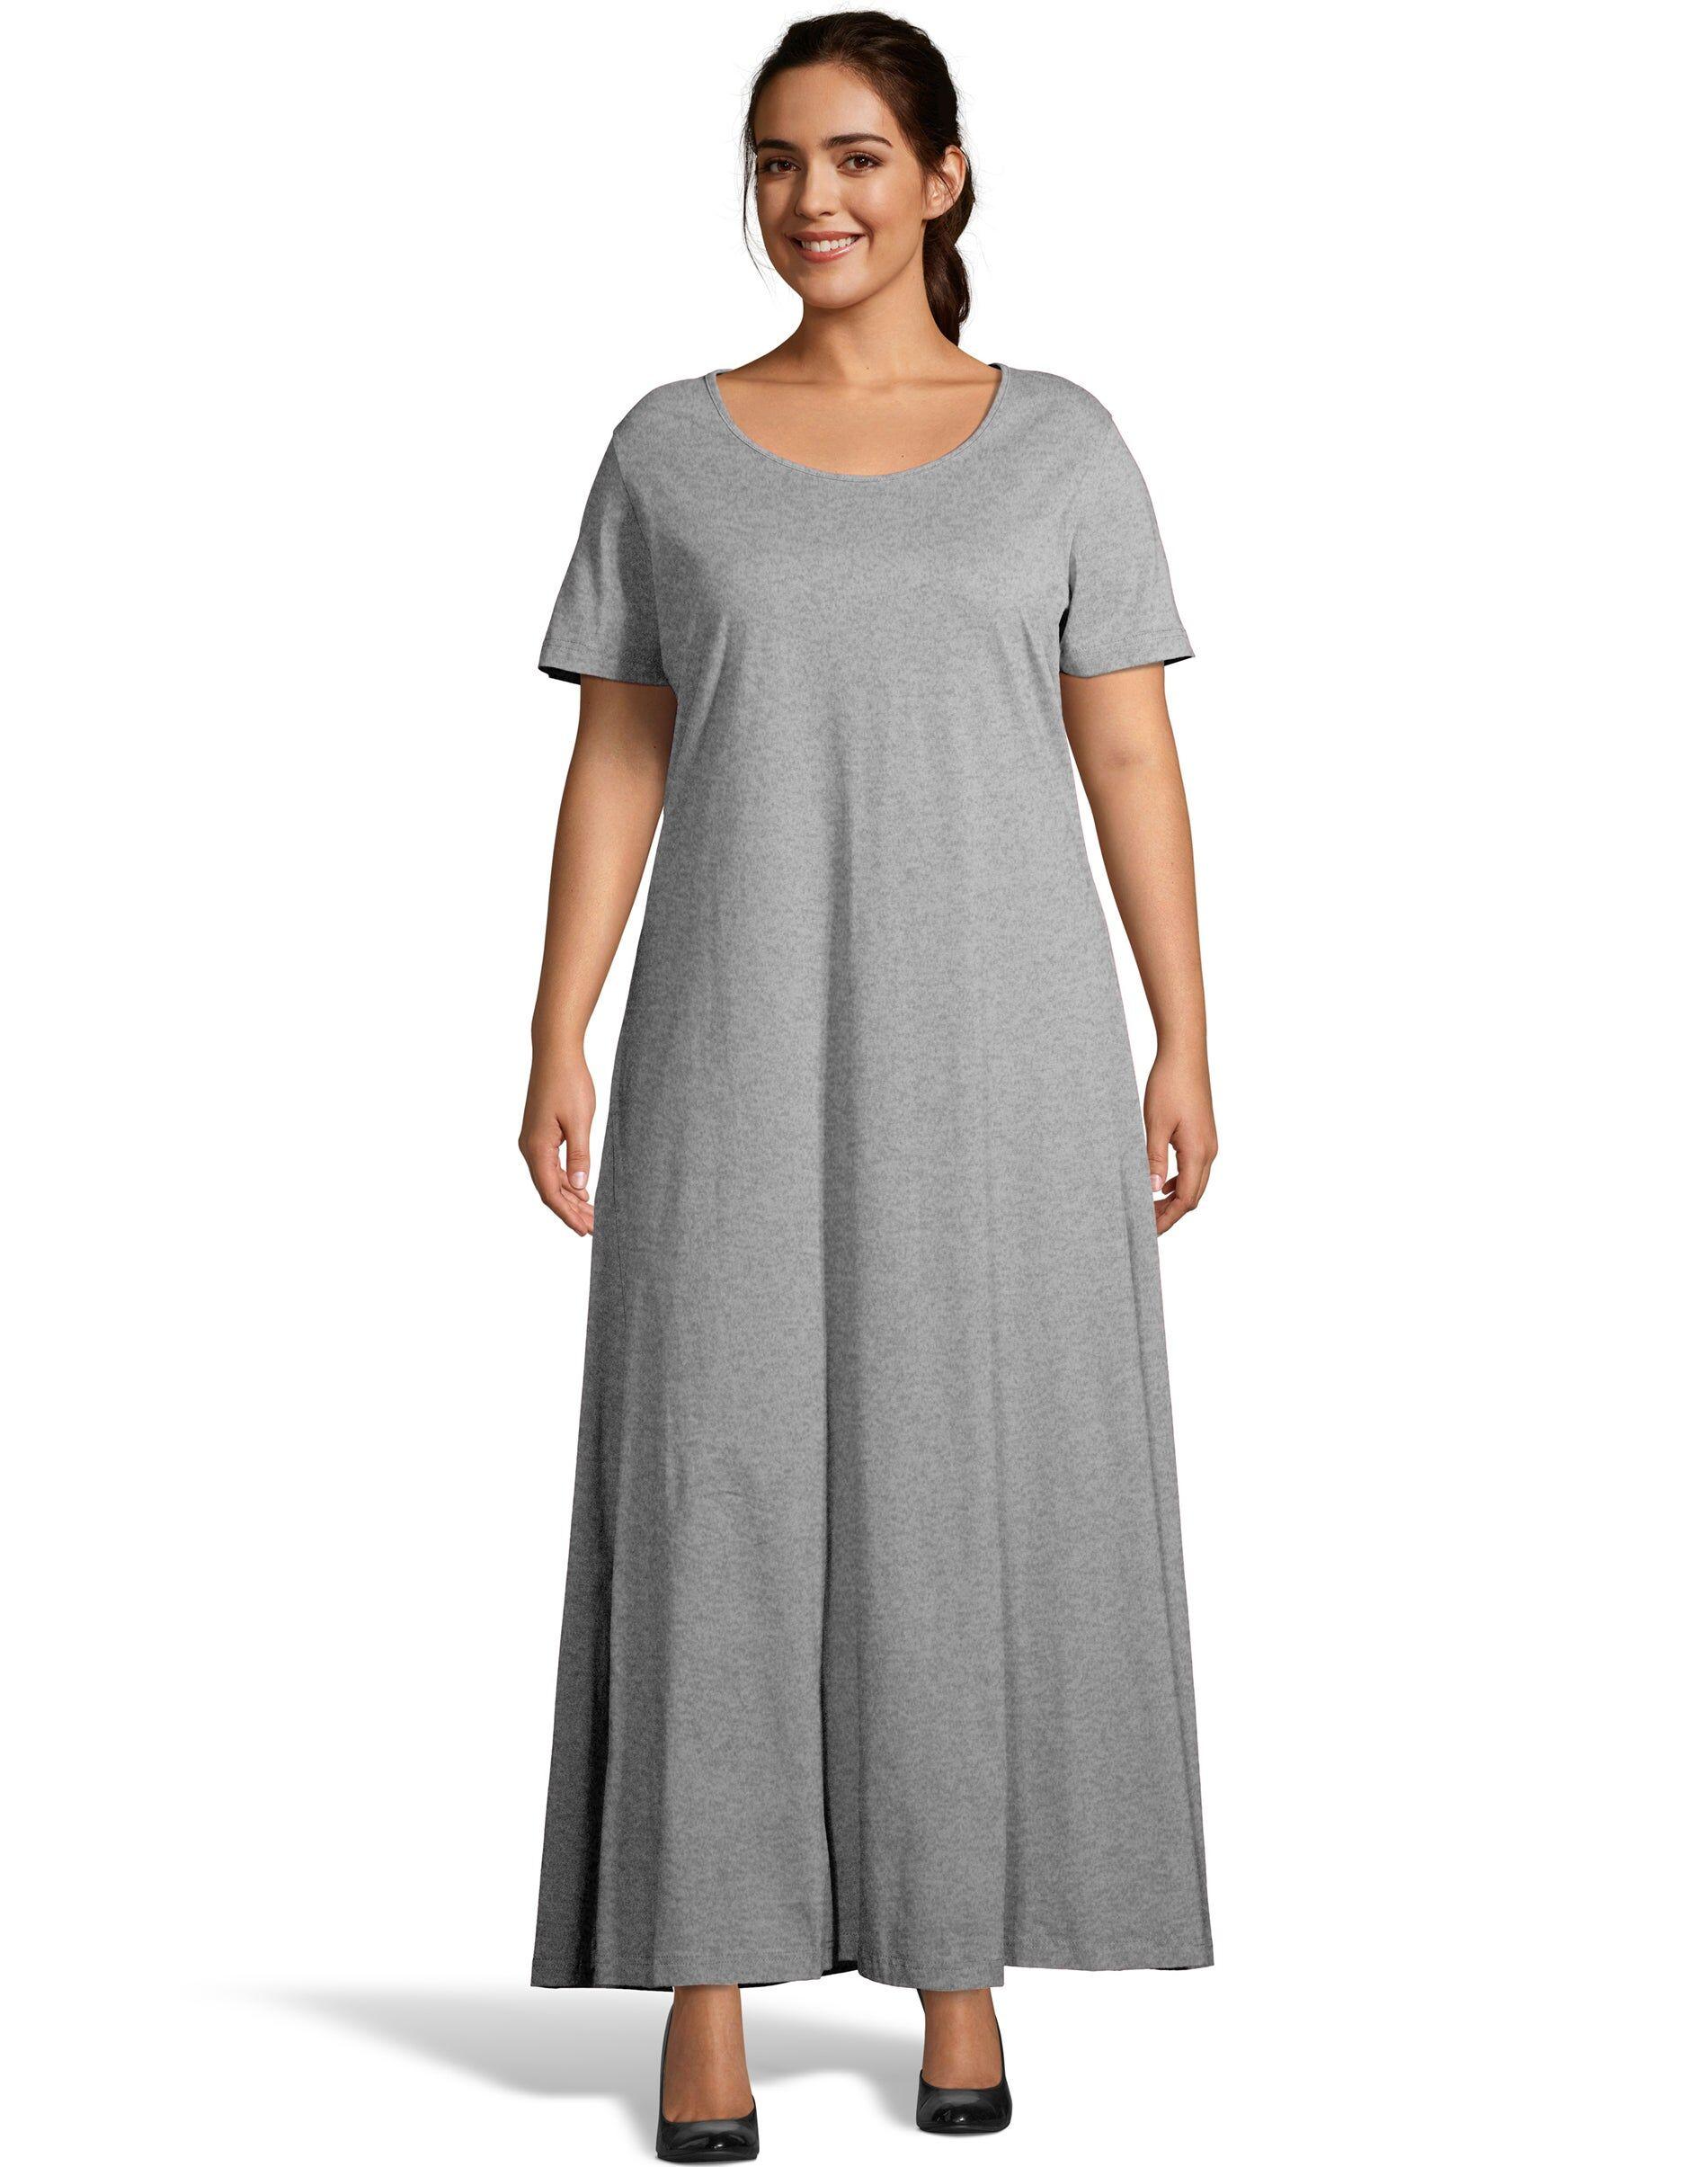 Just My Size Jersey Matchables Maxi Dress Grey Heather 2X Women's